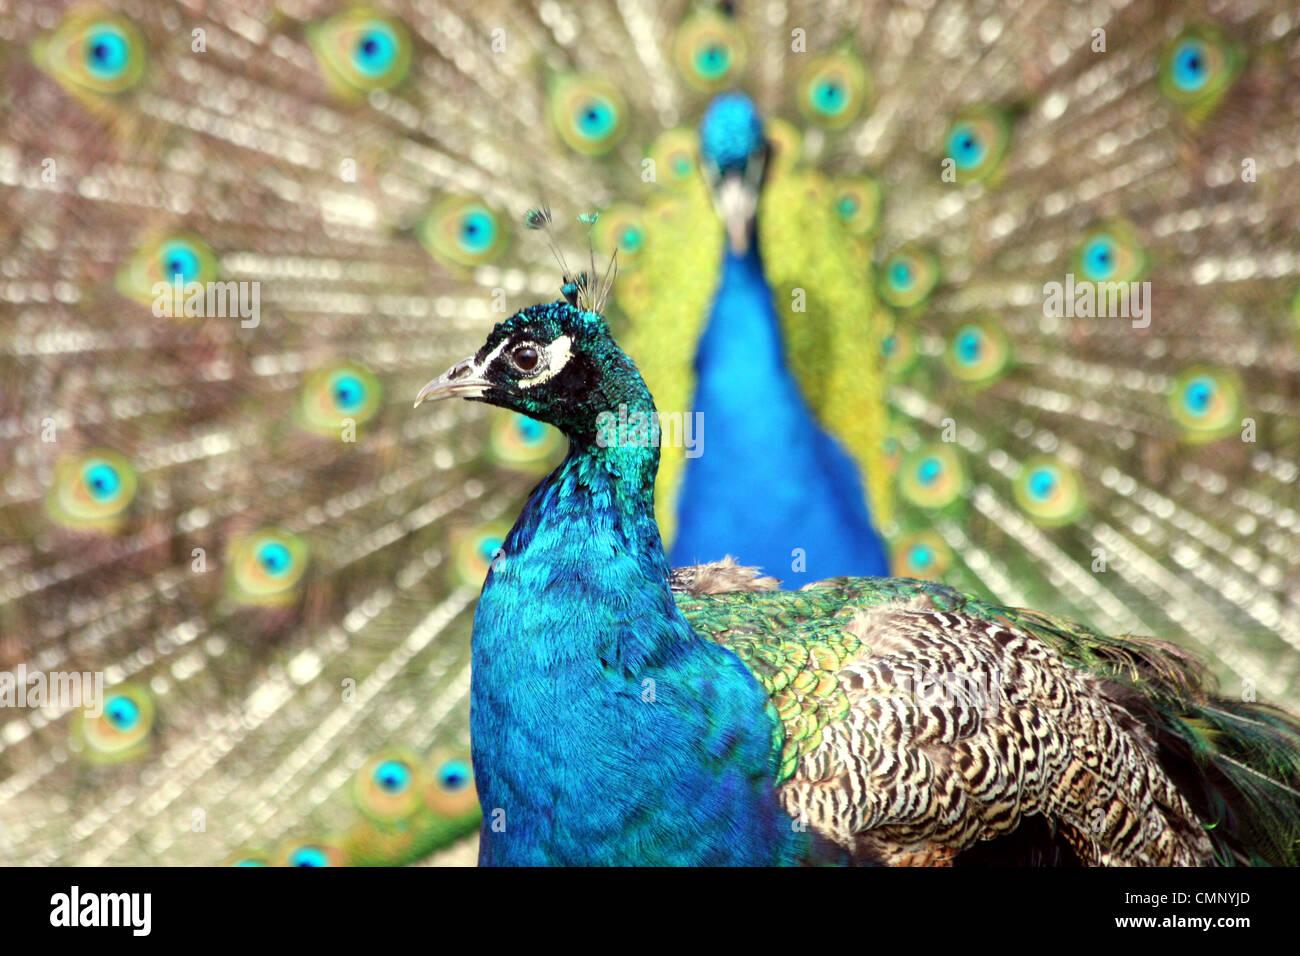 Blue Peacocks - Stock Image